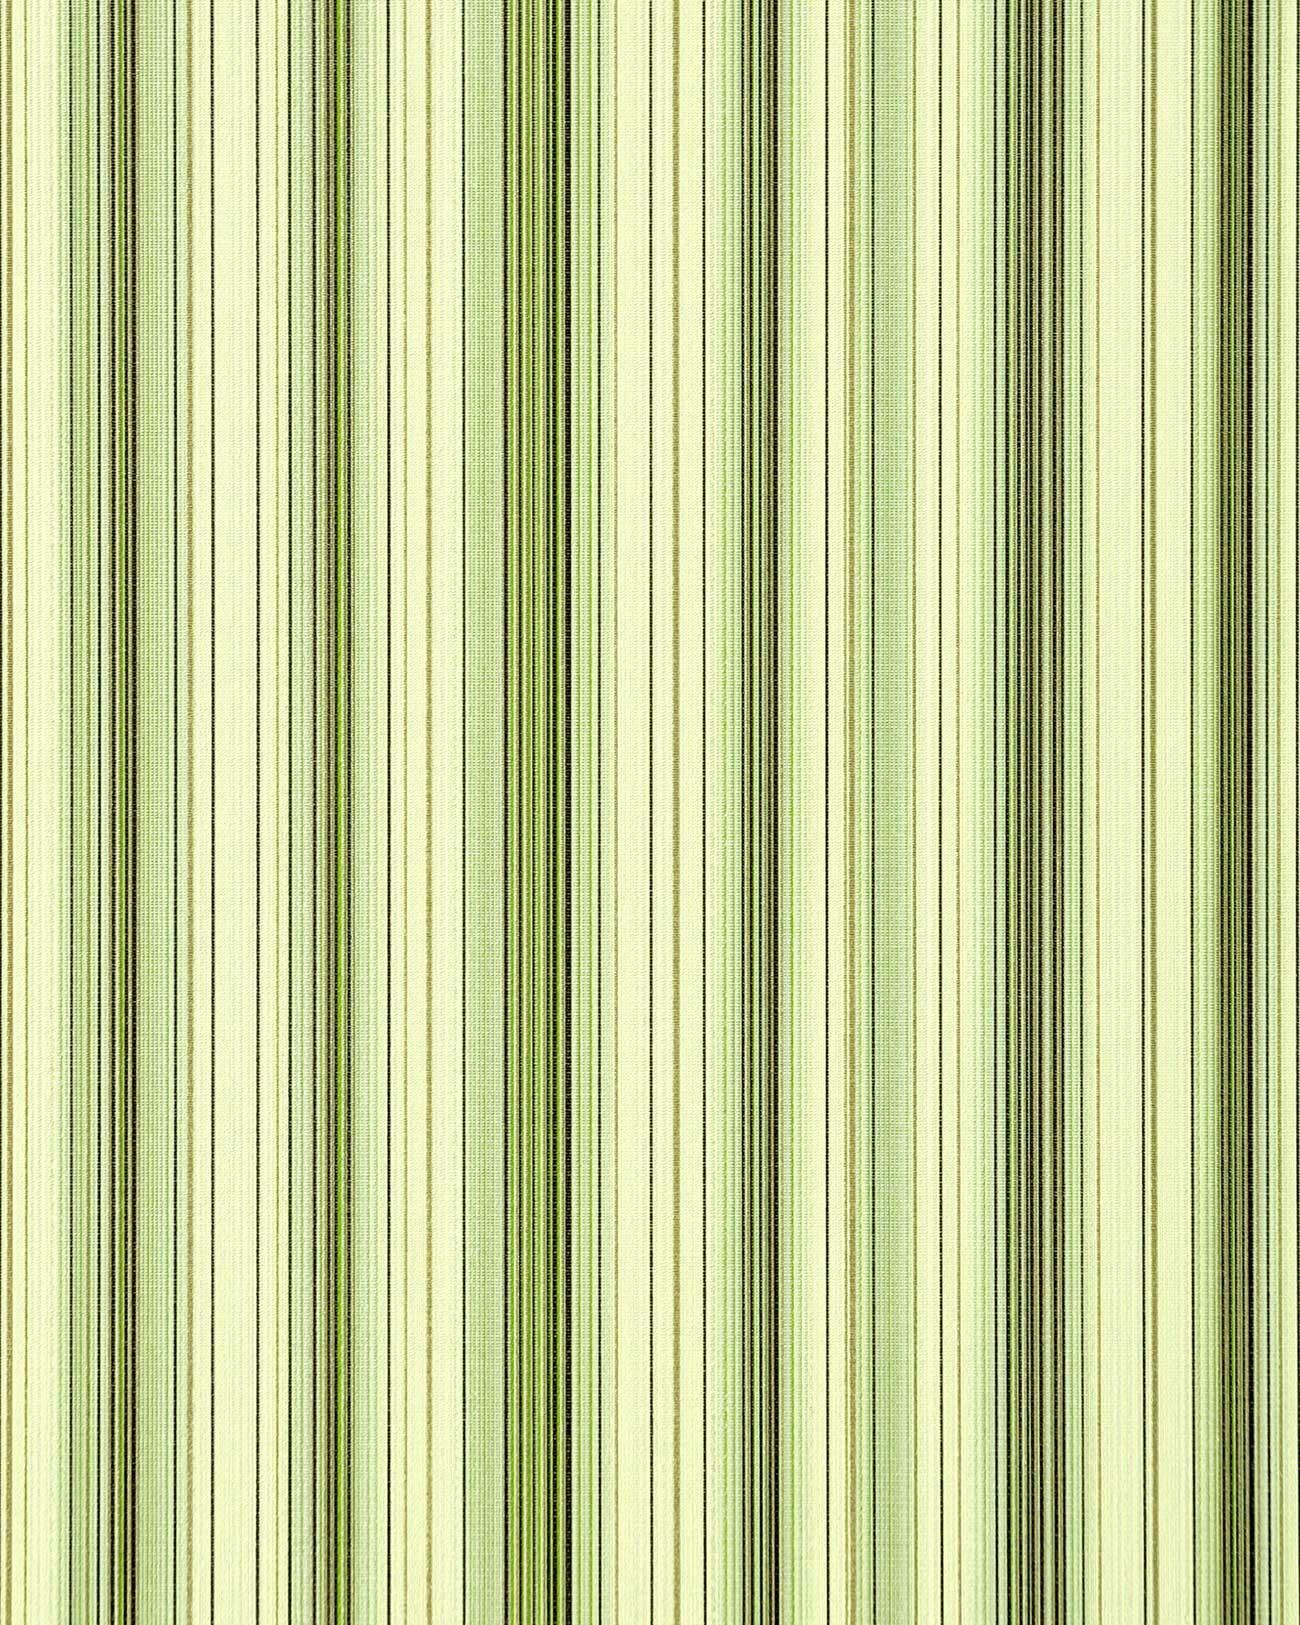 Carta da parati vinilica edem 097 25 a strisce disegno a for Tappezzeria a righe